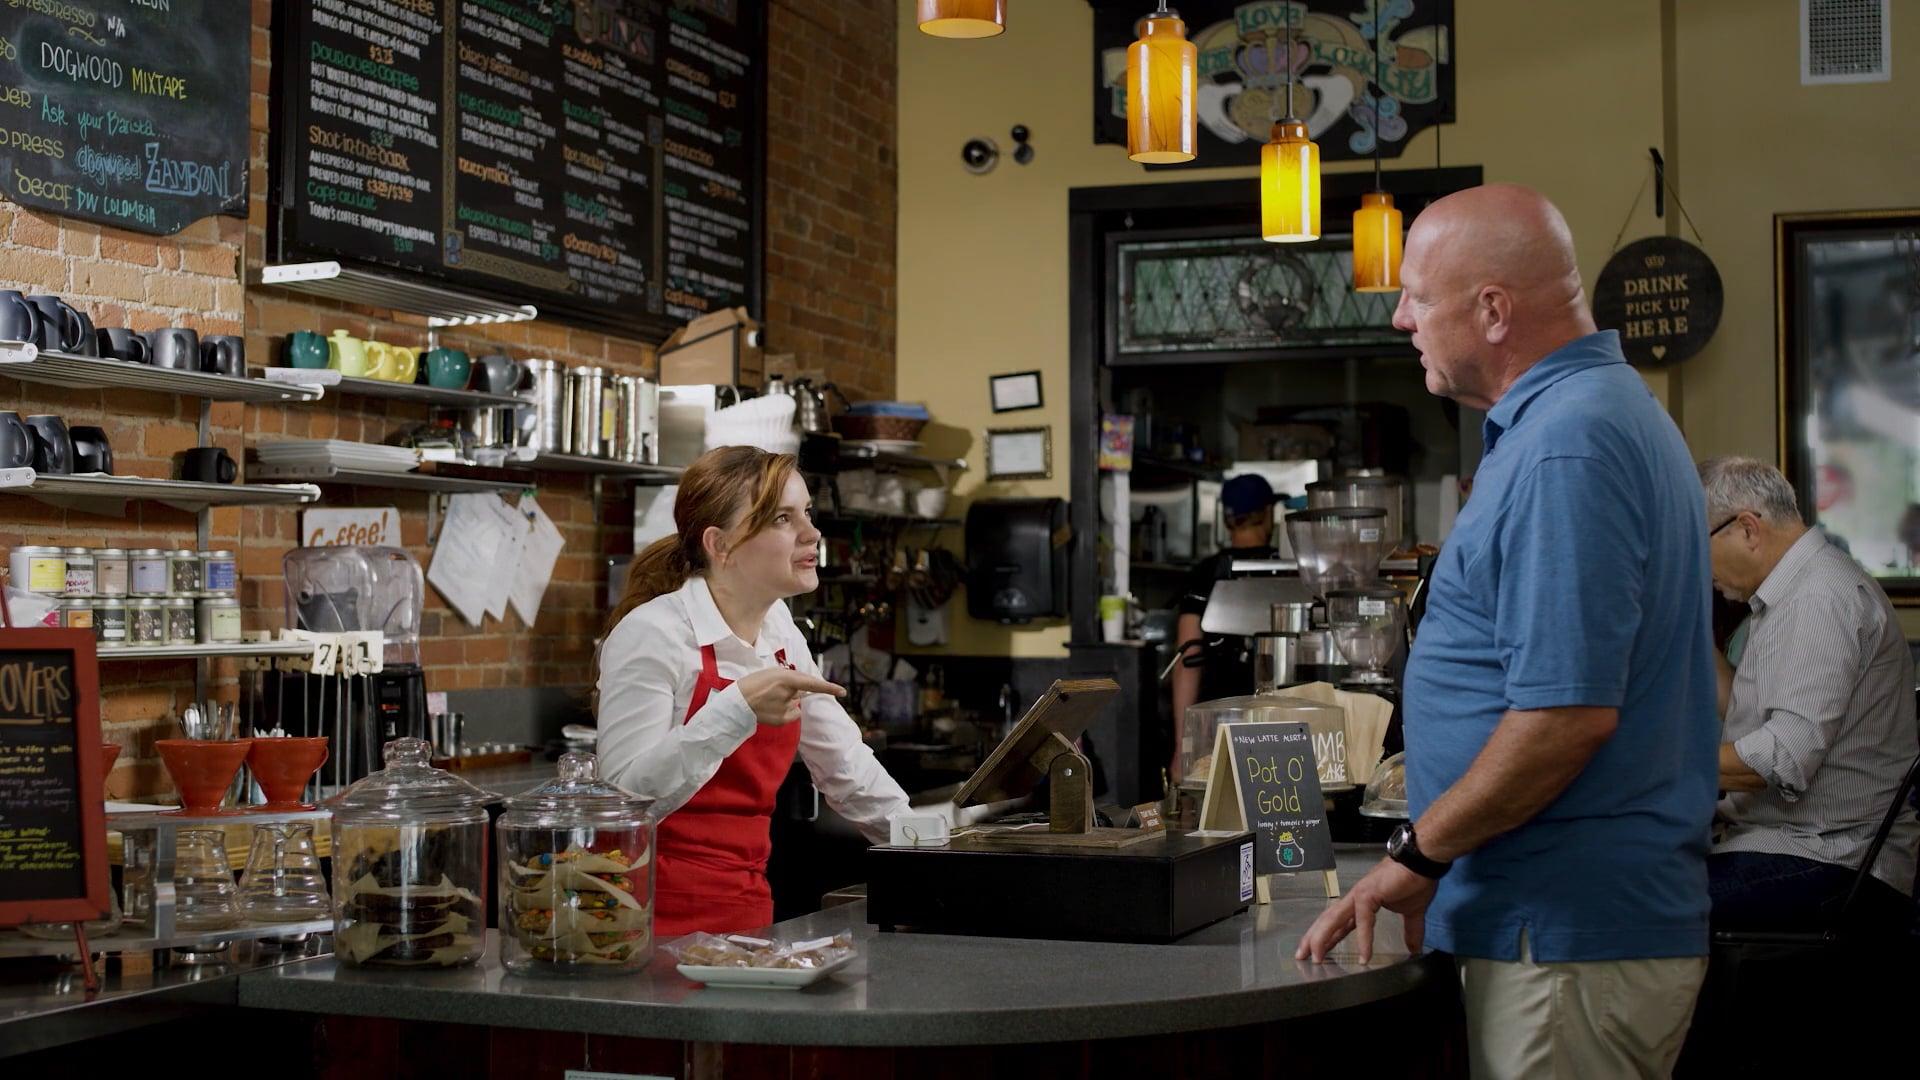 COFFEE SHOP - Jeff Belzer's TV Commerical